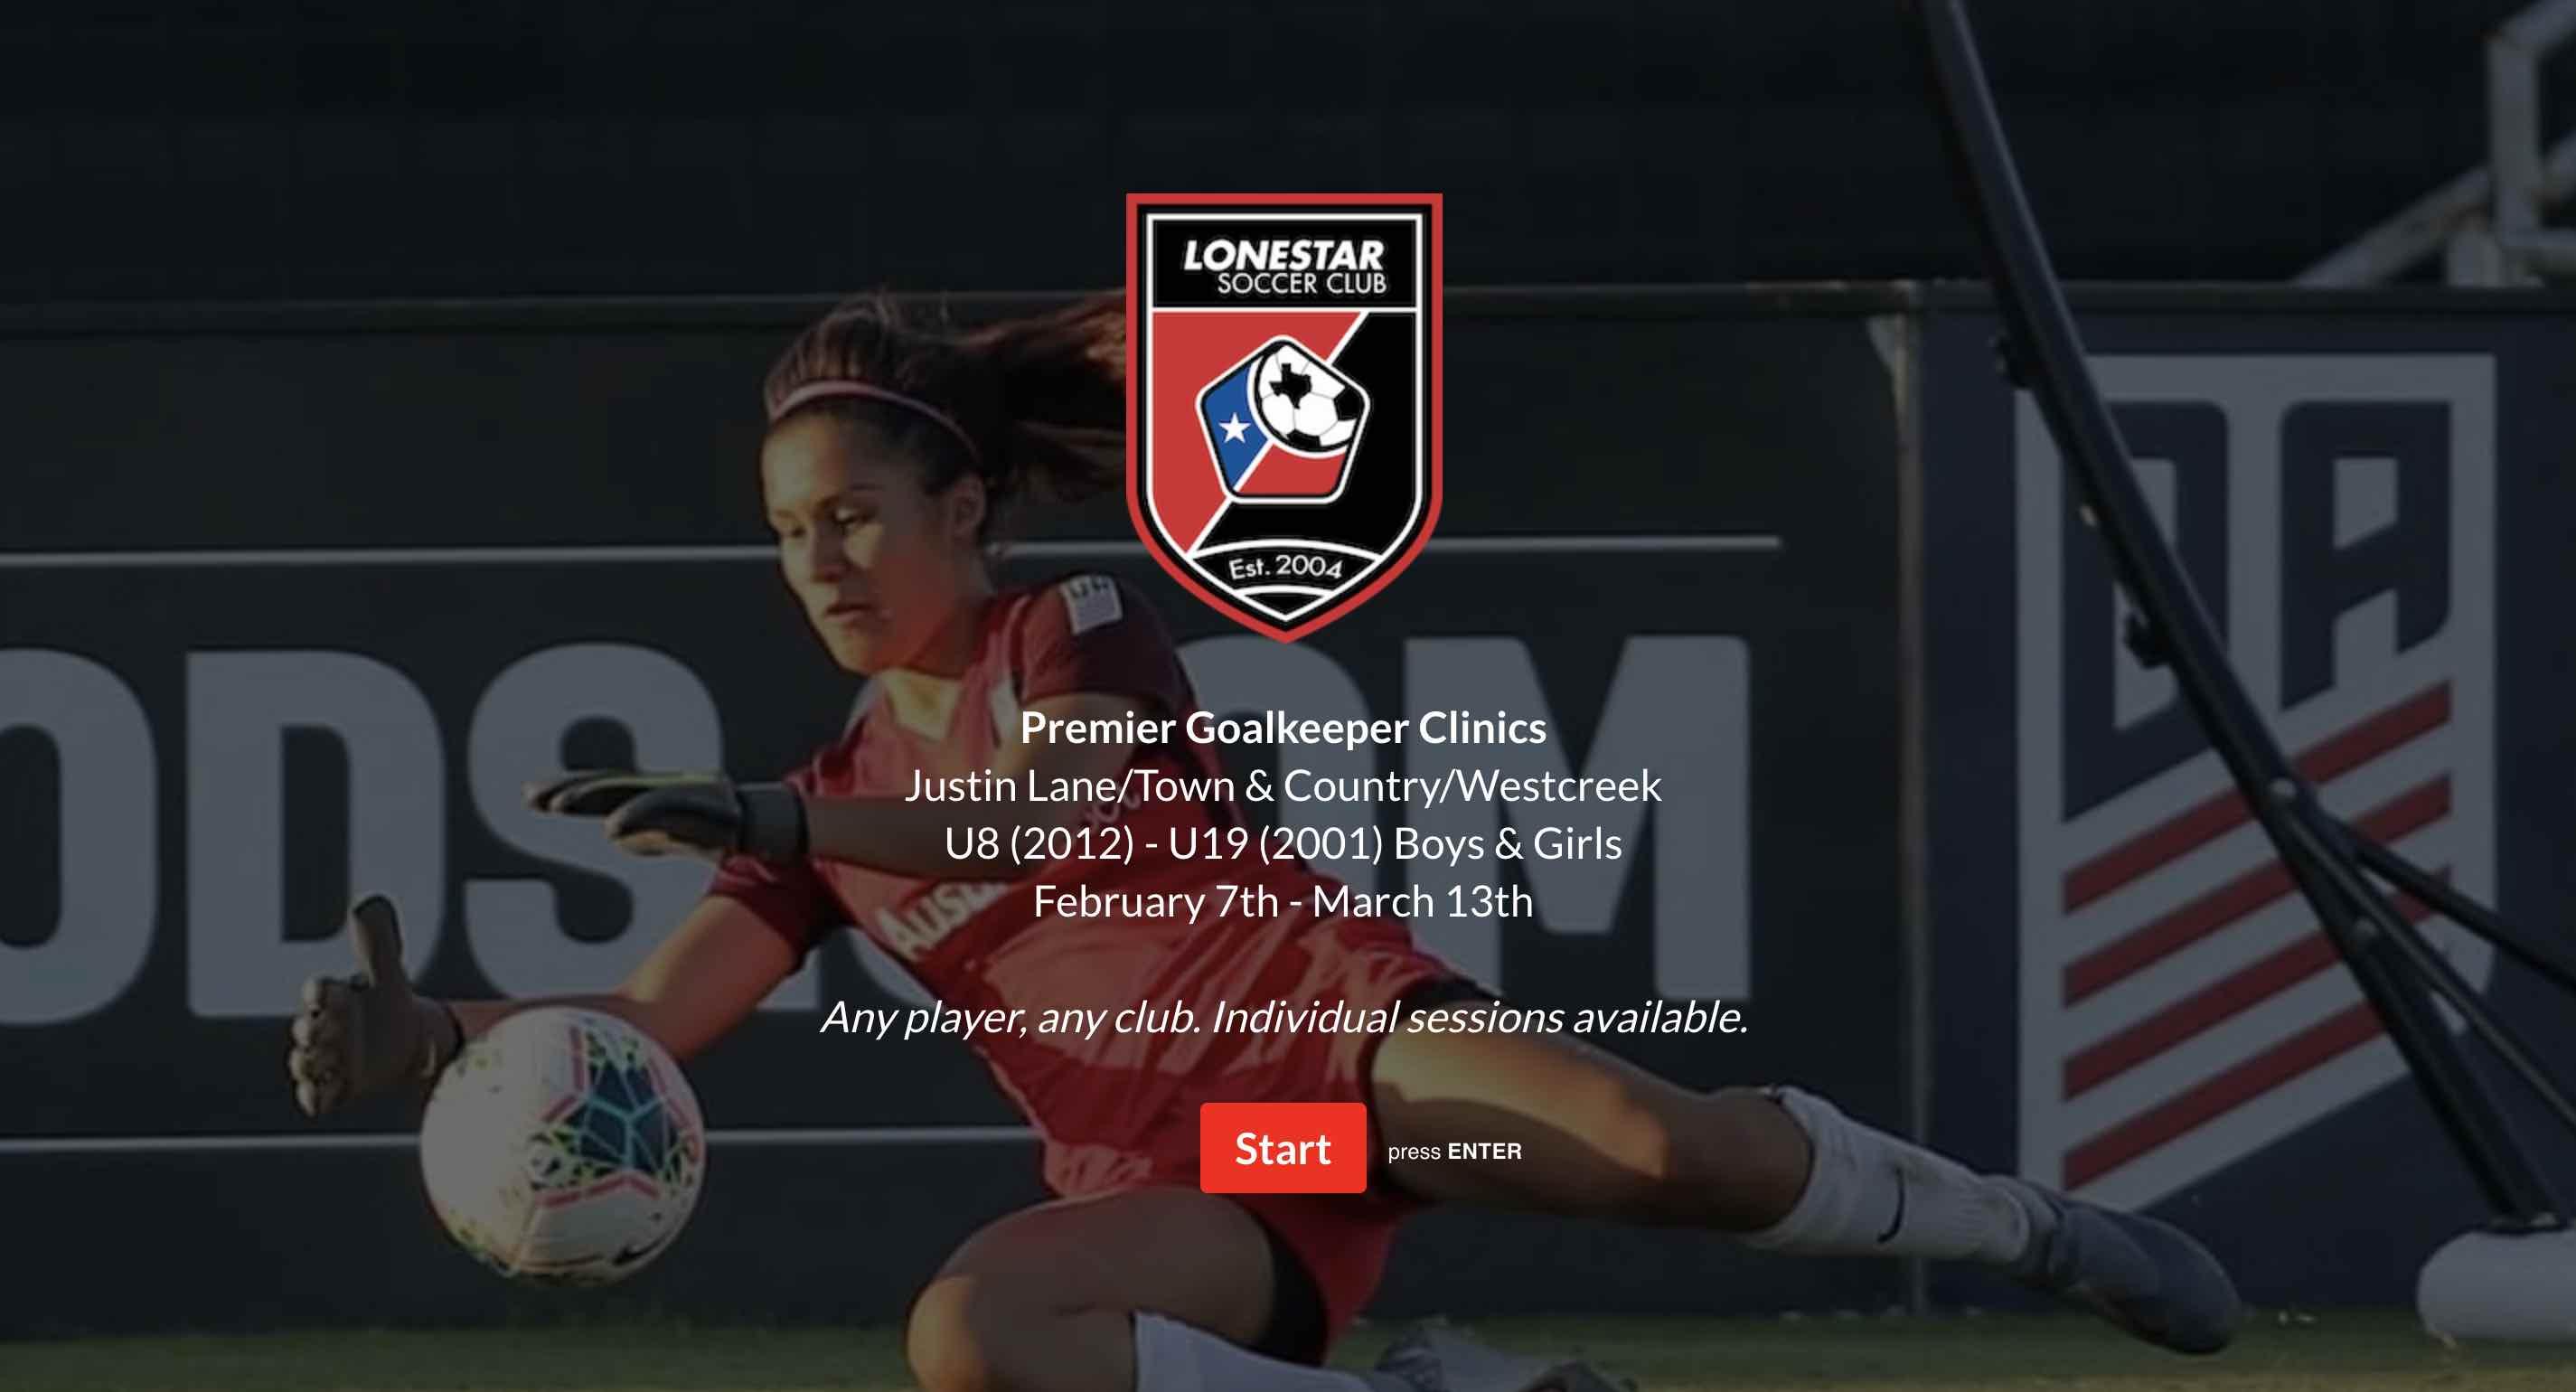 Premier Goalkeeper Clinics logo